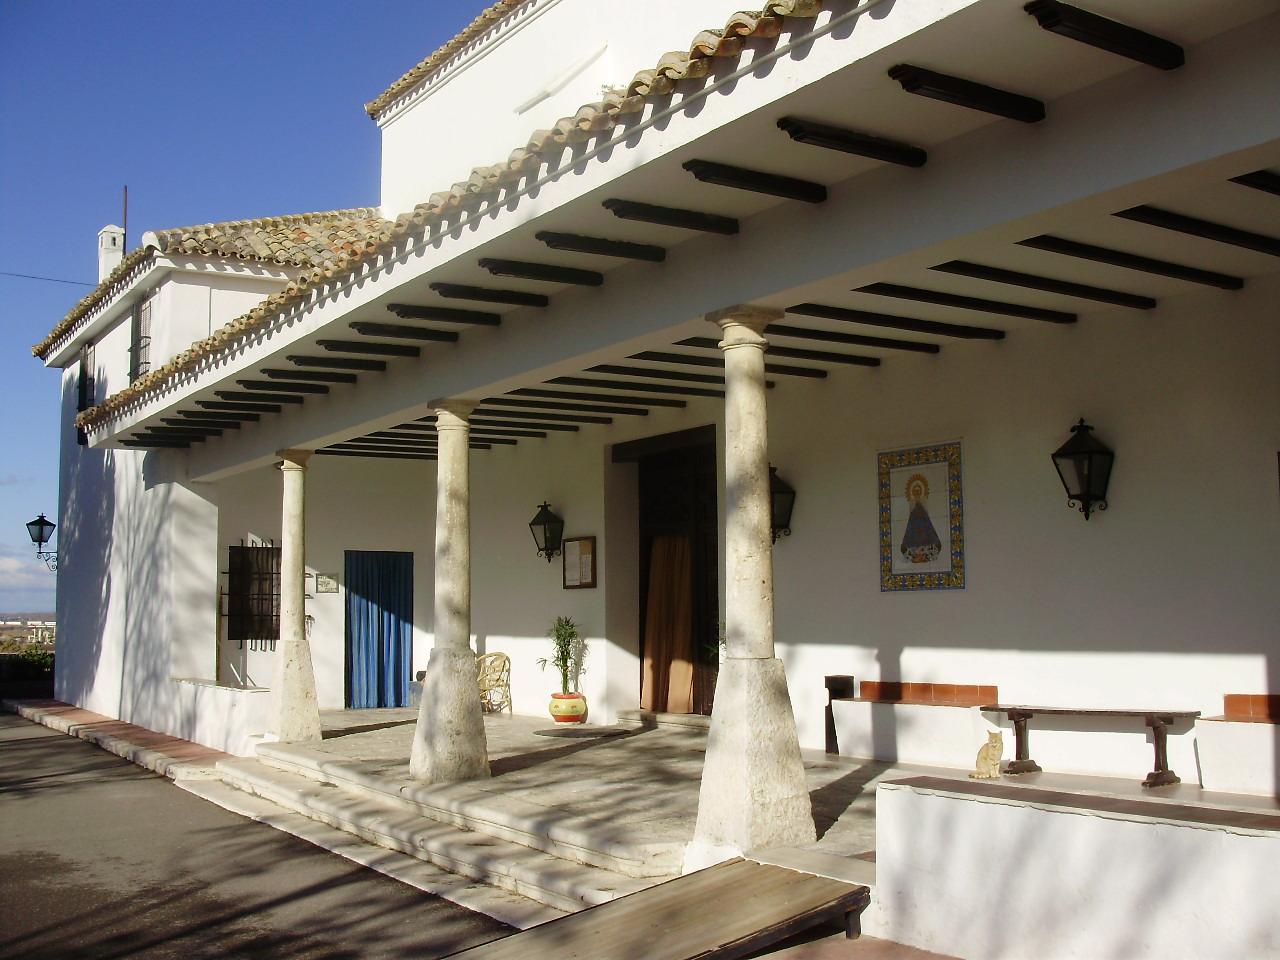 Santuario del Castellar